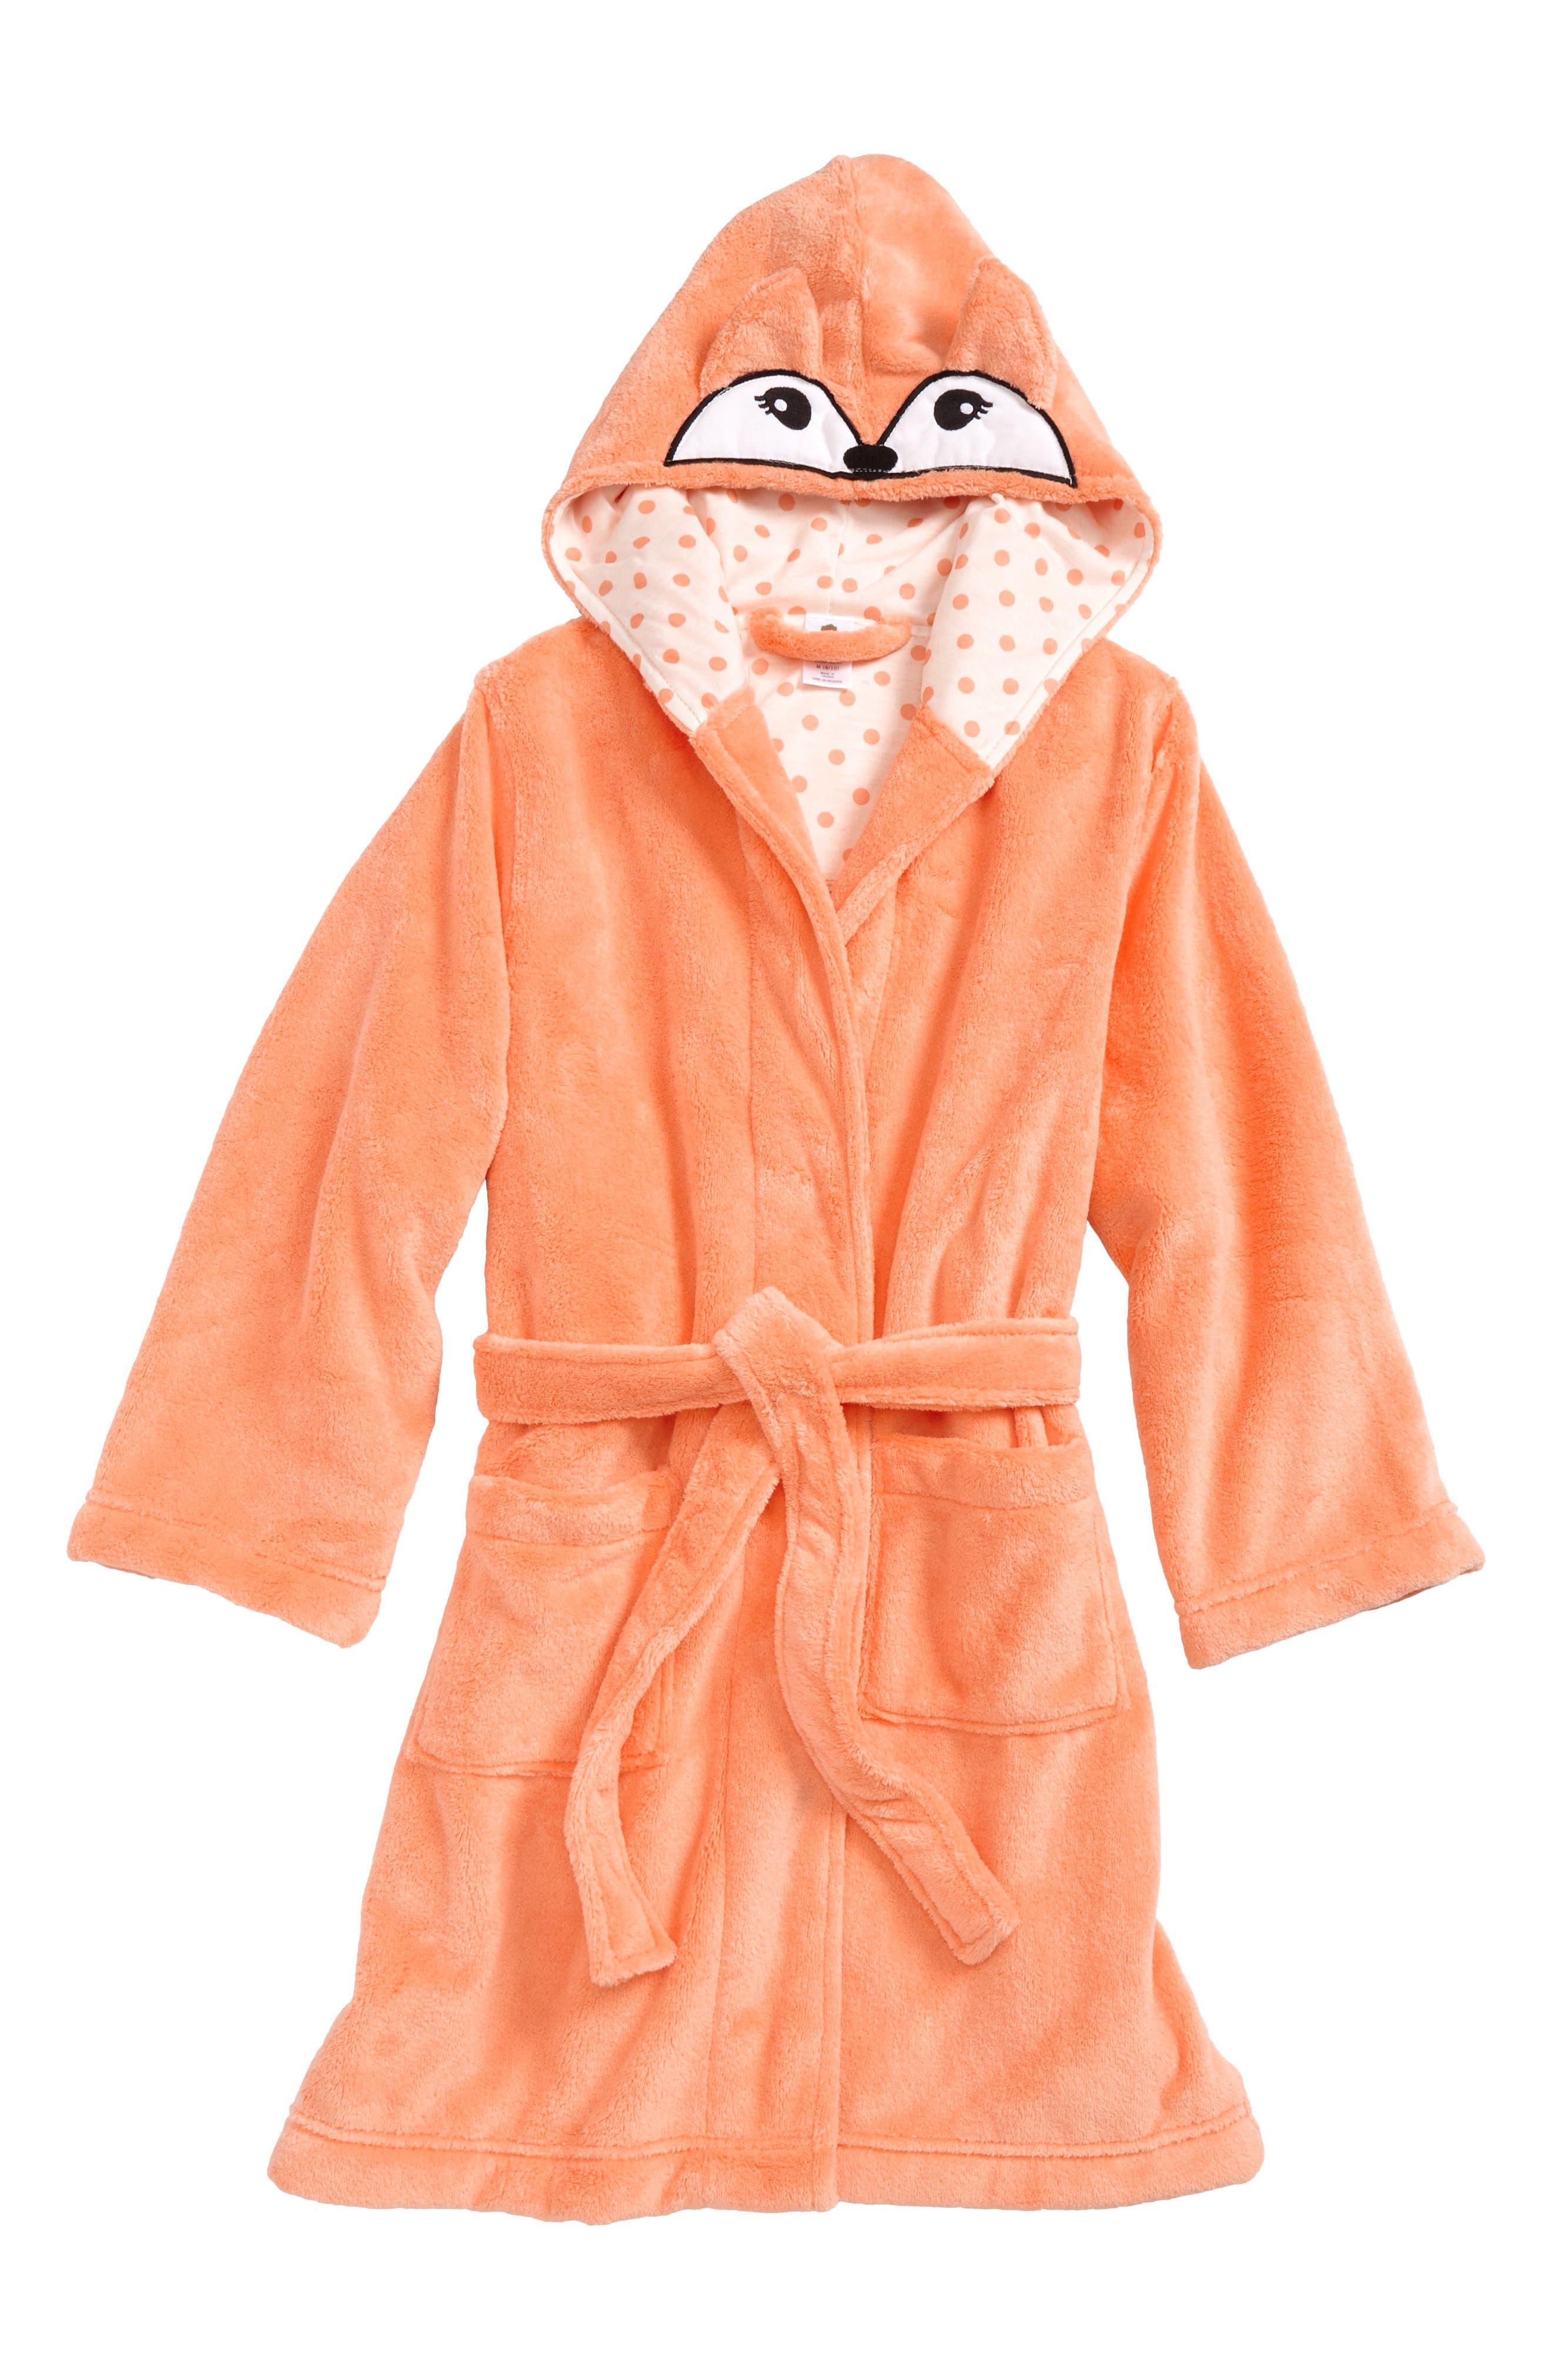 Fox Plush Robe,                             Main thumbnail 1, color,                             955